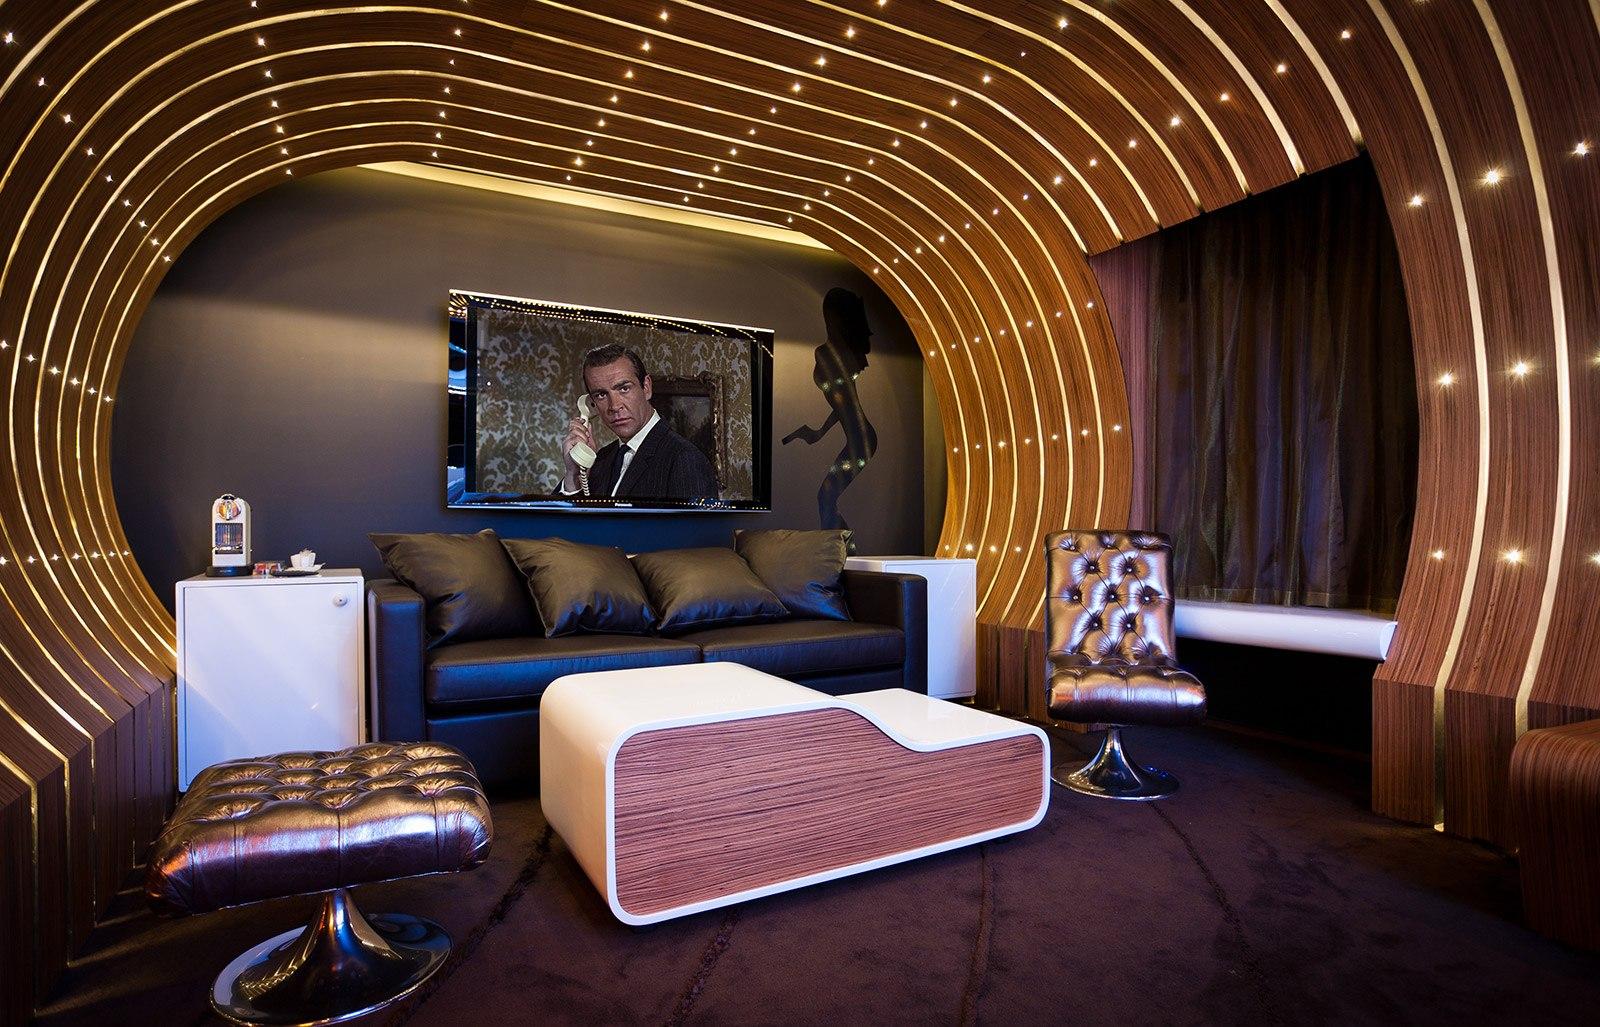 James Bond Hotel Room